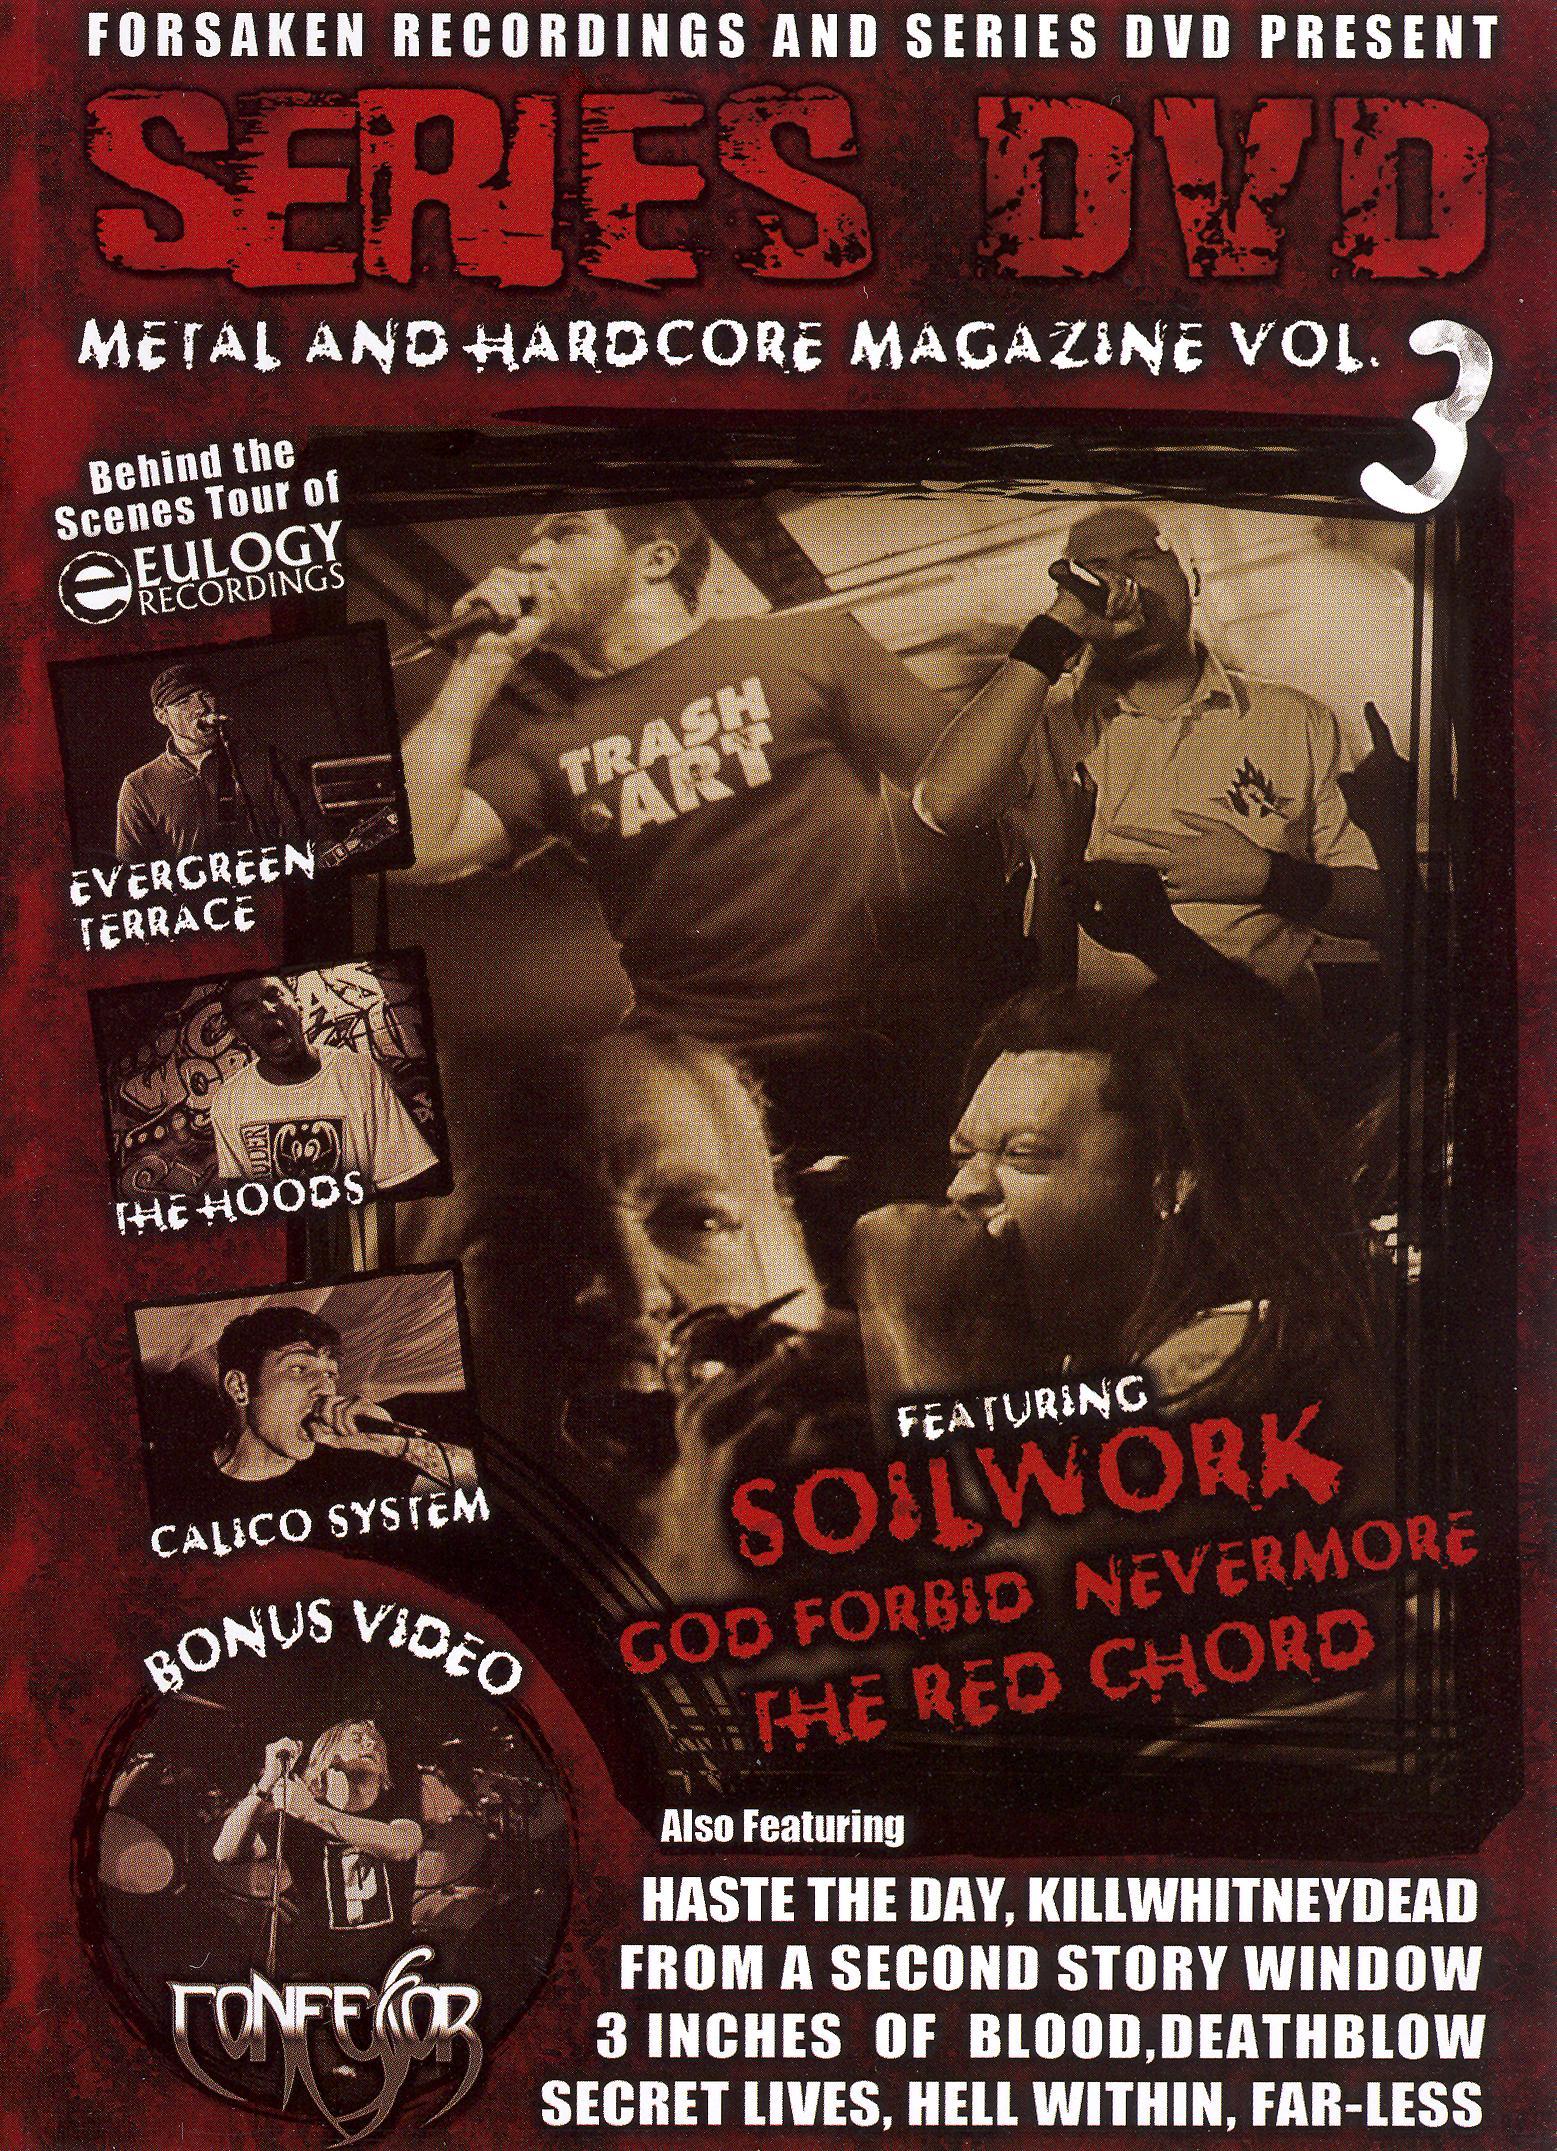 Series DVD: Metal and Hardcore, Vol. 3